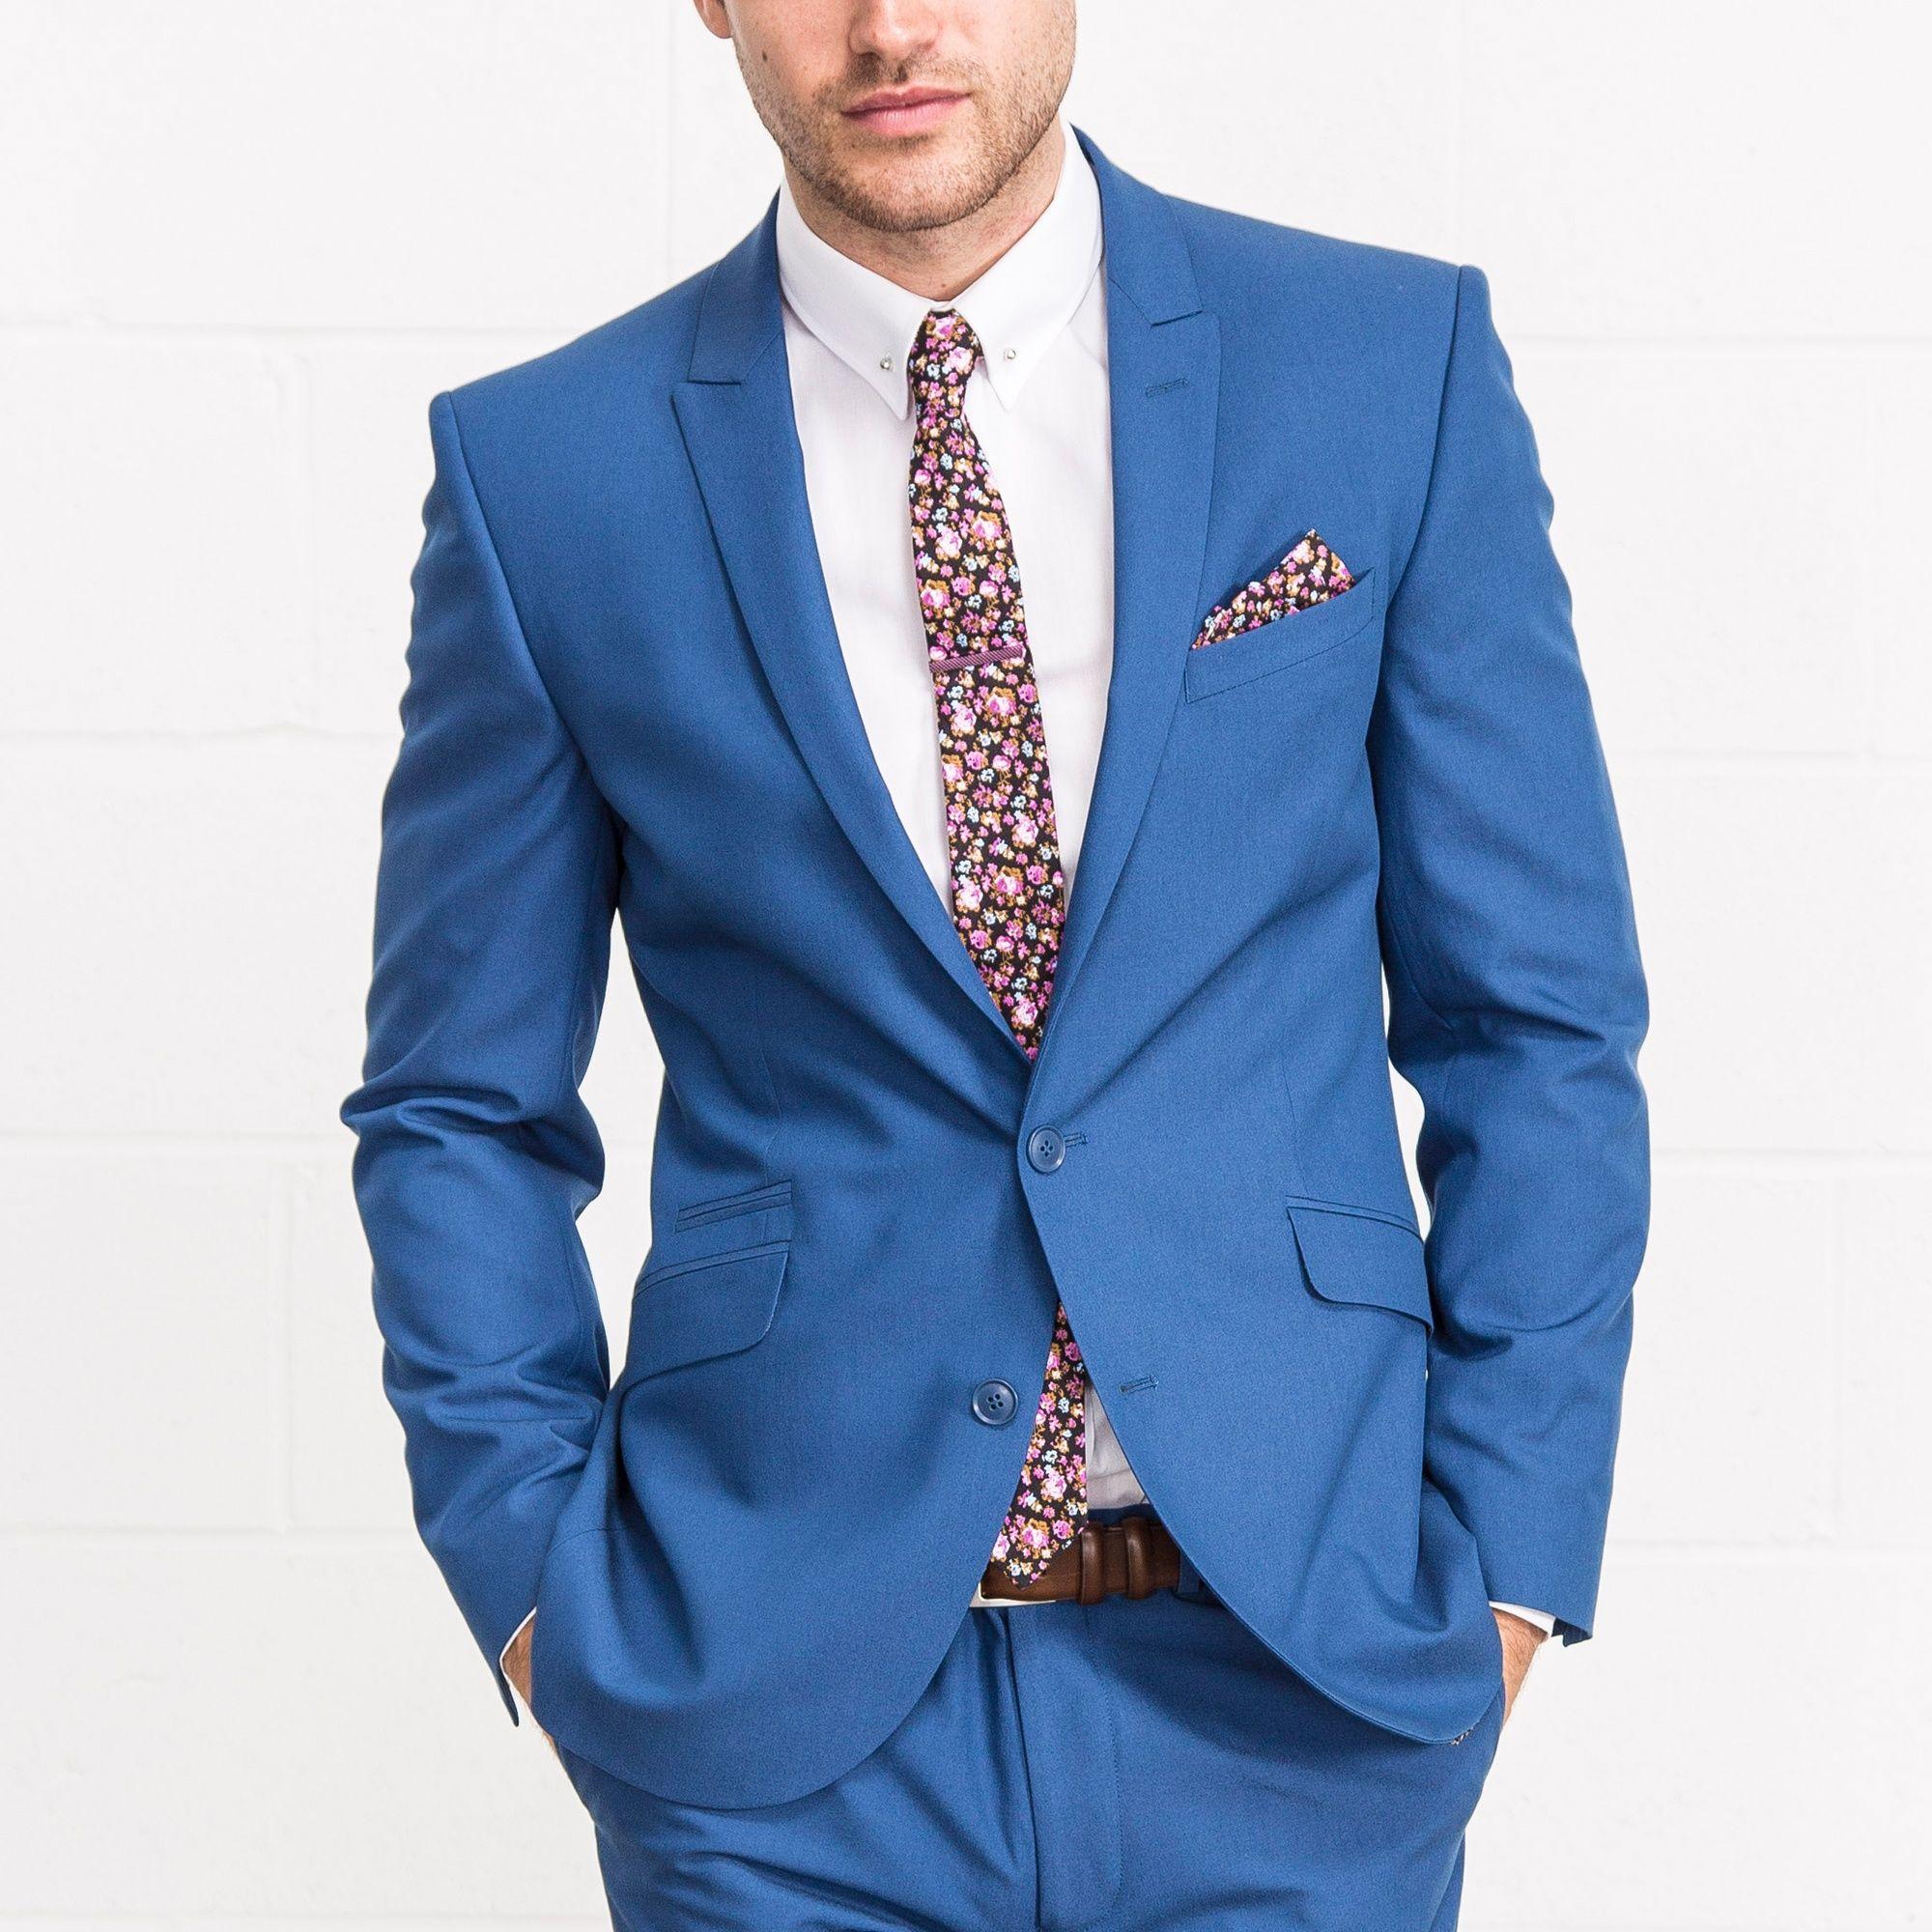 LAMBRETTA Slim Fit Bright Blue Two Piece Suit | Smart Casual ...